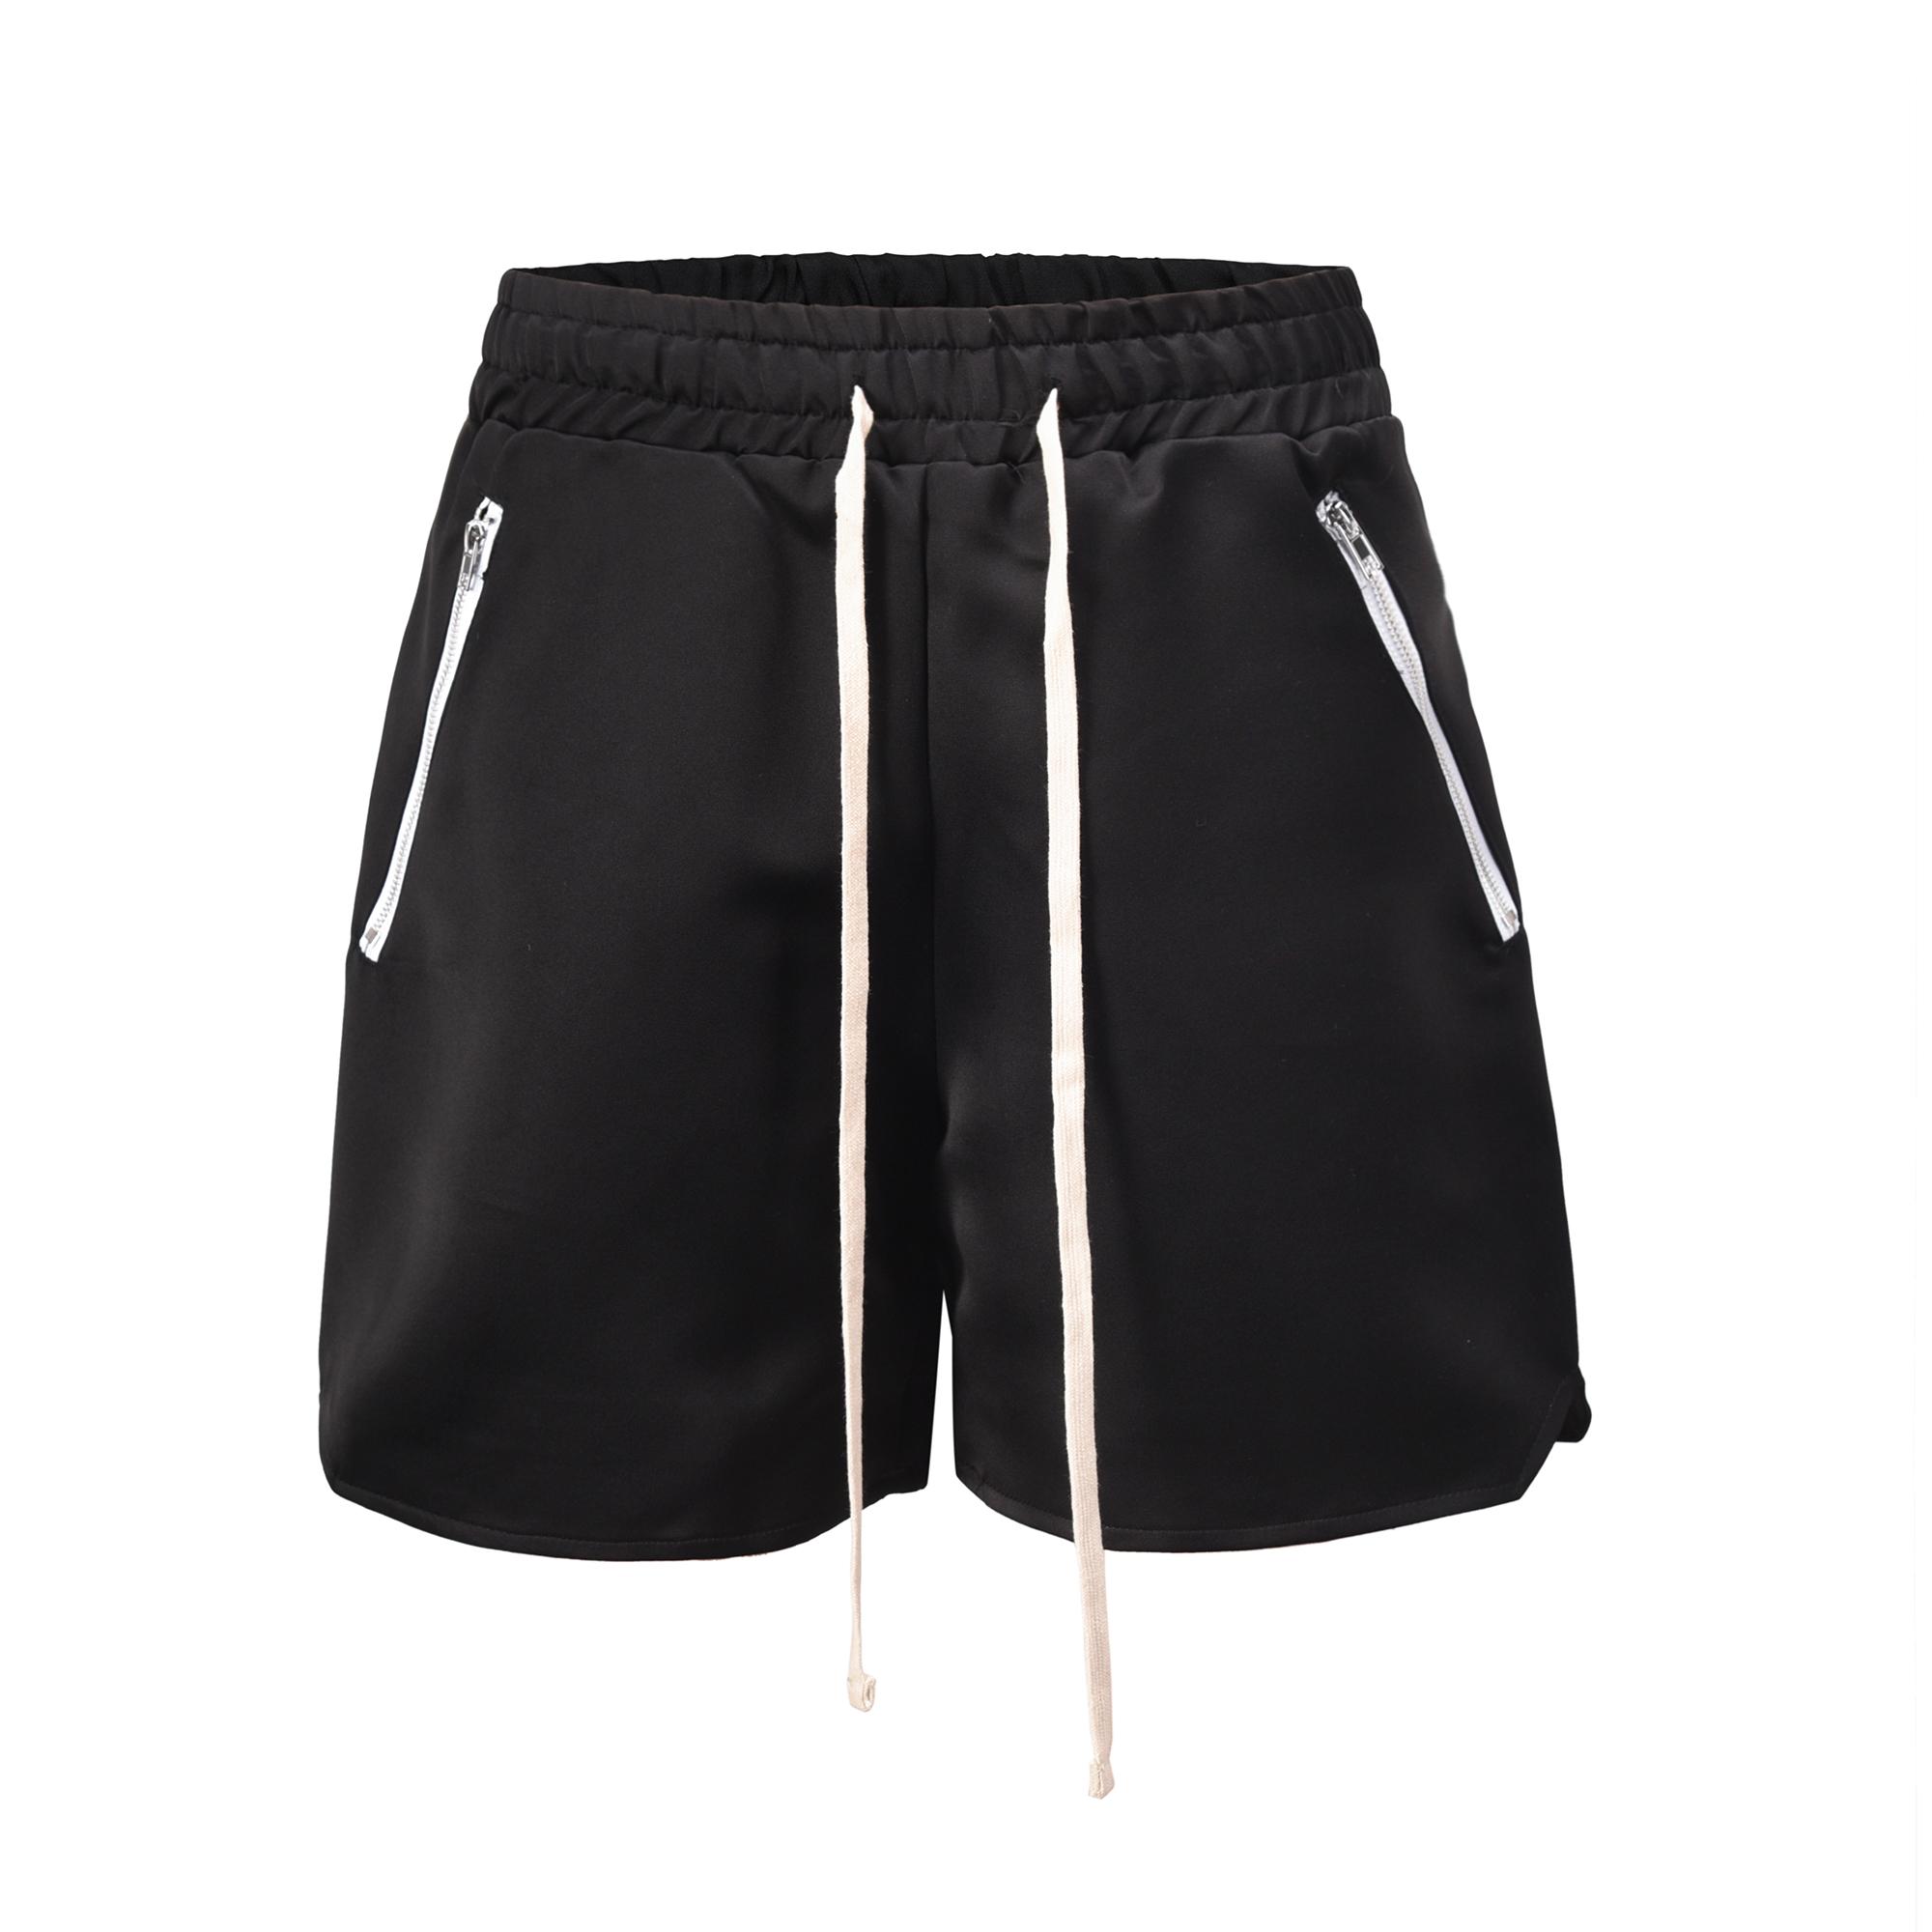 OEM Shorts Long Drawstring dropshipping FOG men nylon cargo shorts black short pants men